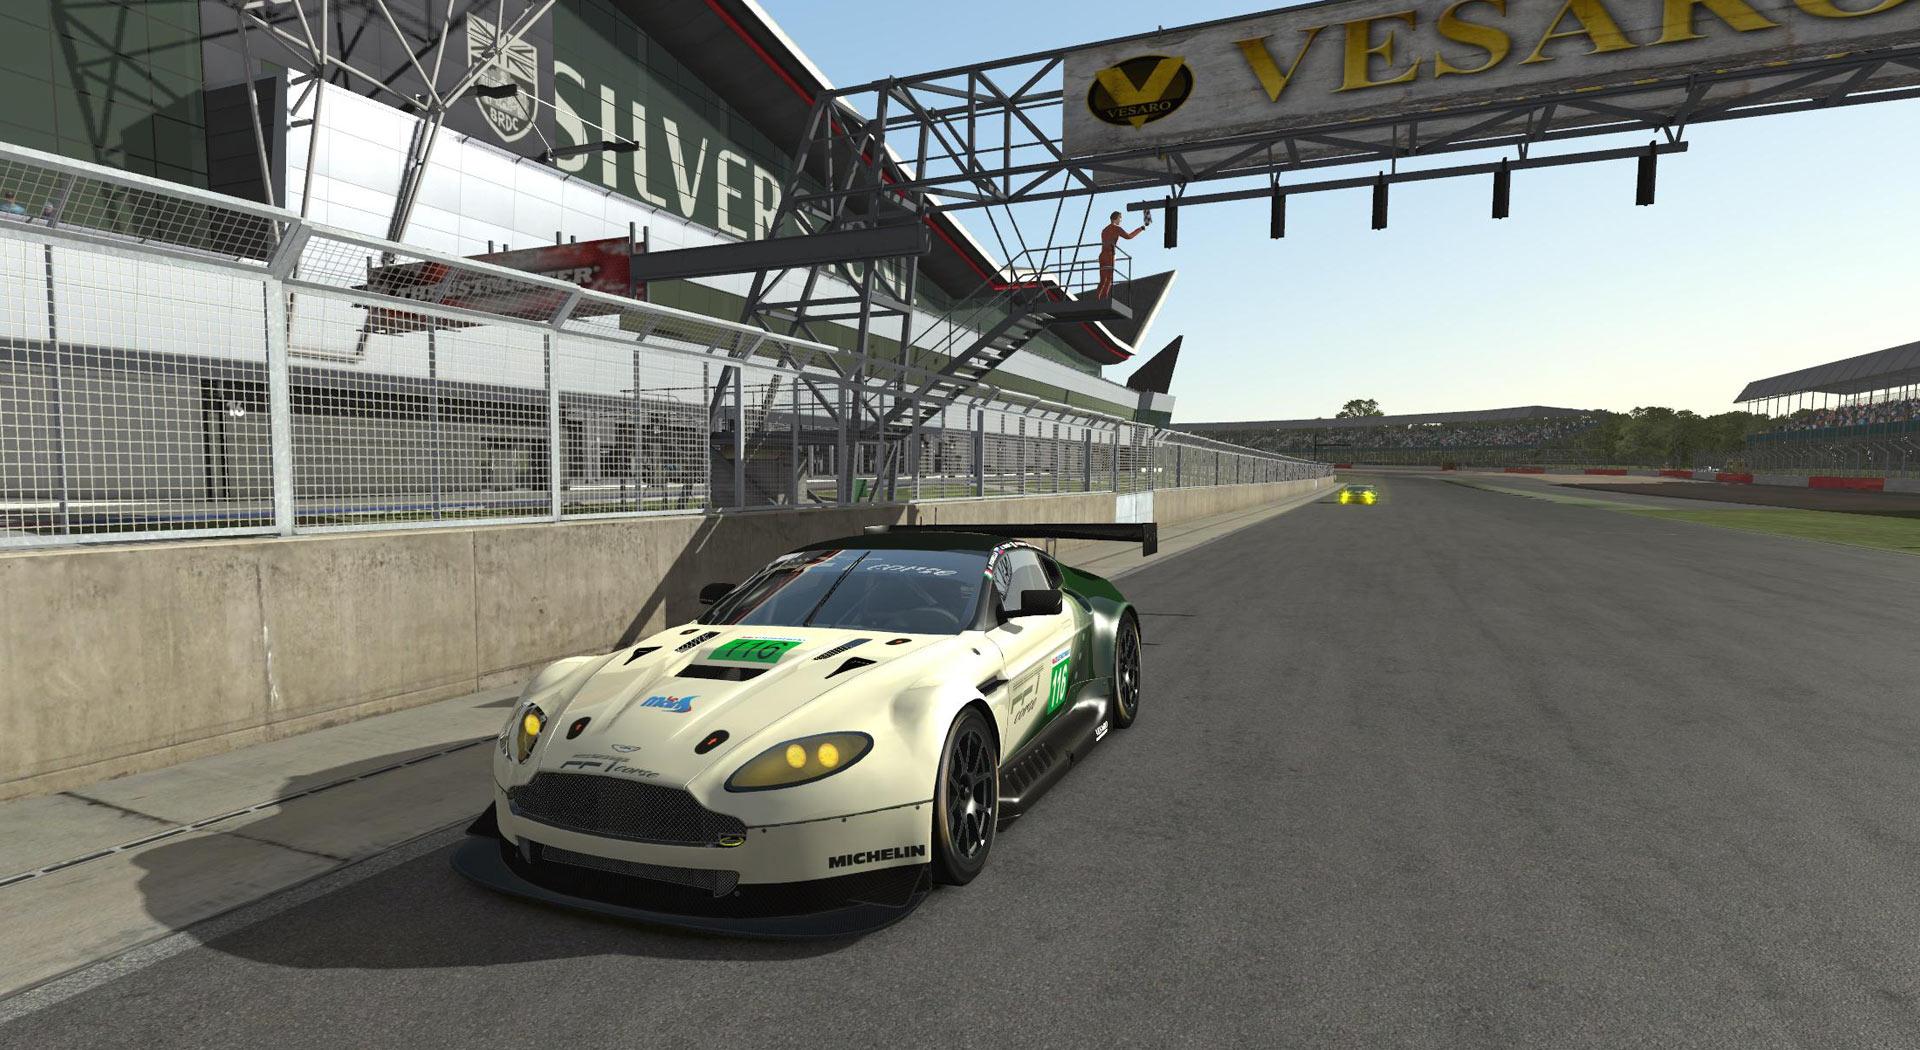 RDLMS by Vesaro - Round 2 Silverstone - FTT Corse.jpg